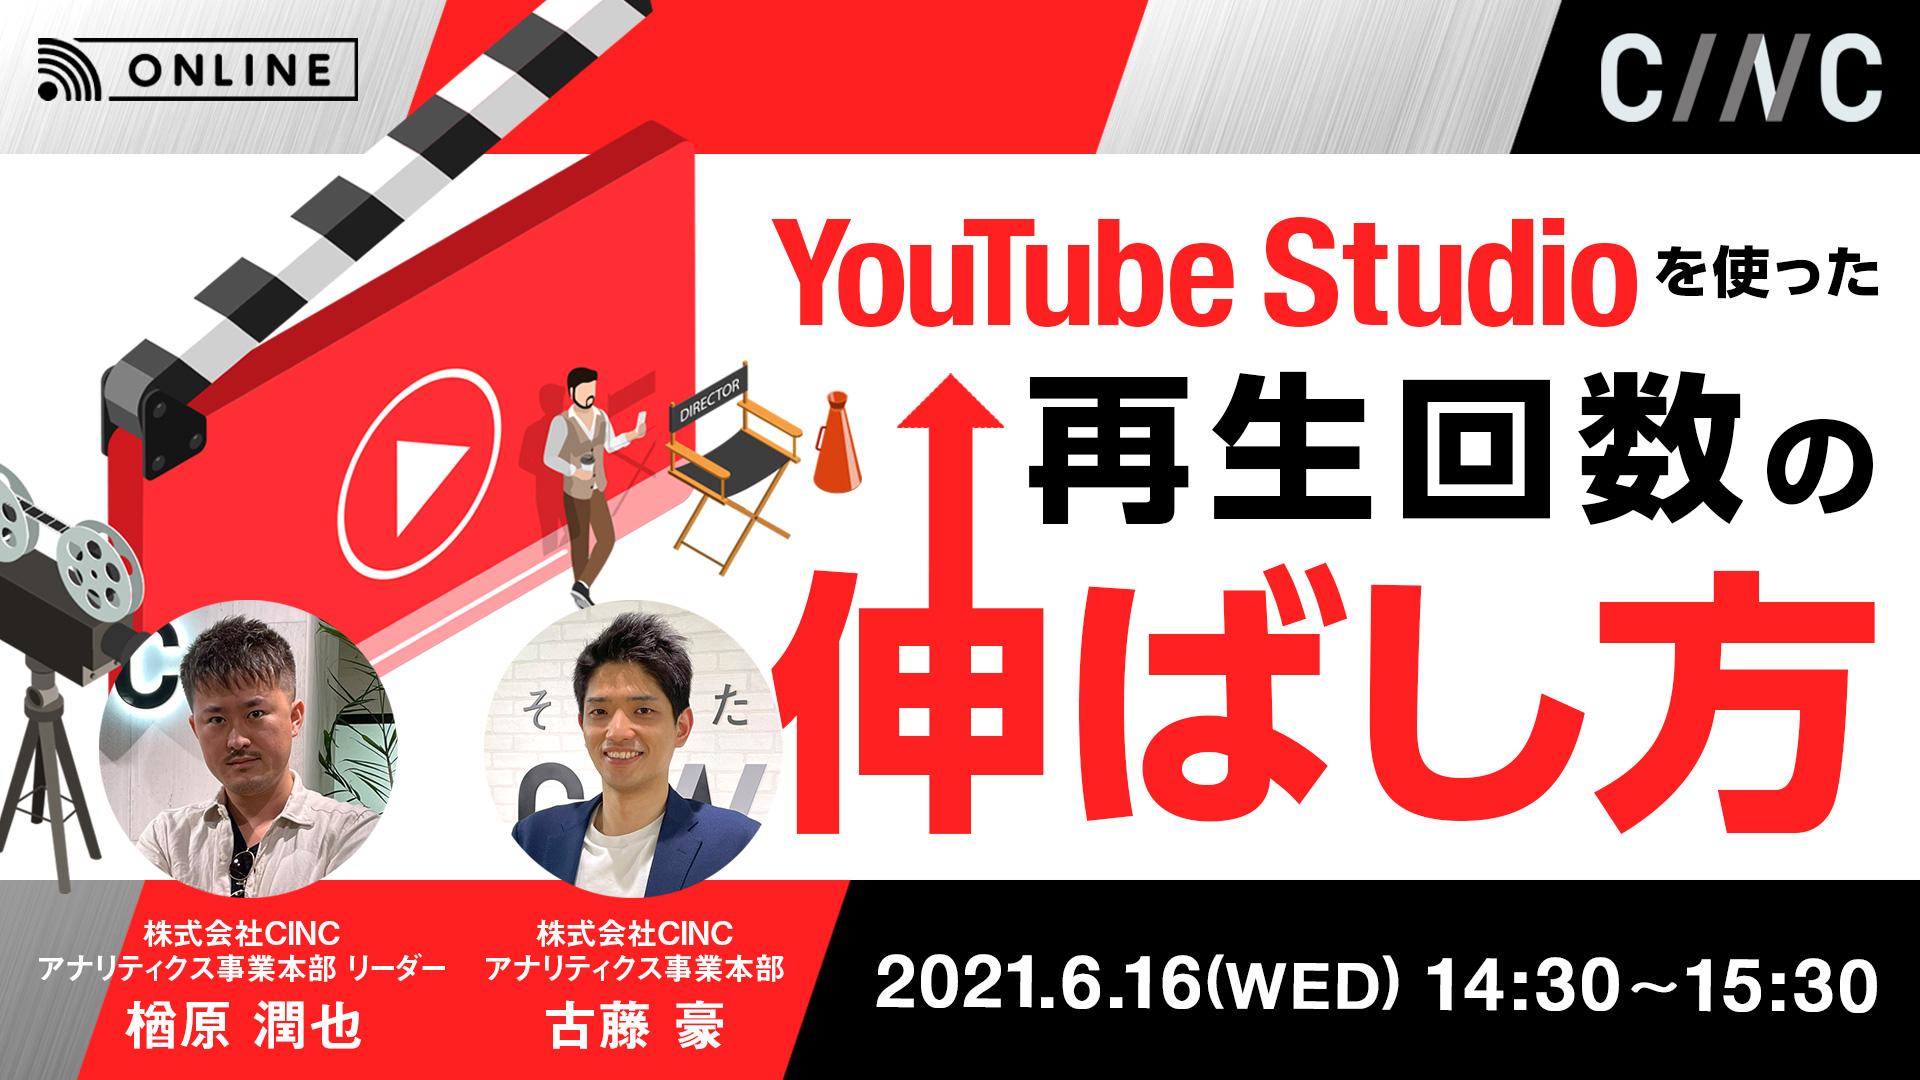 20210531_youtube_1920x1080